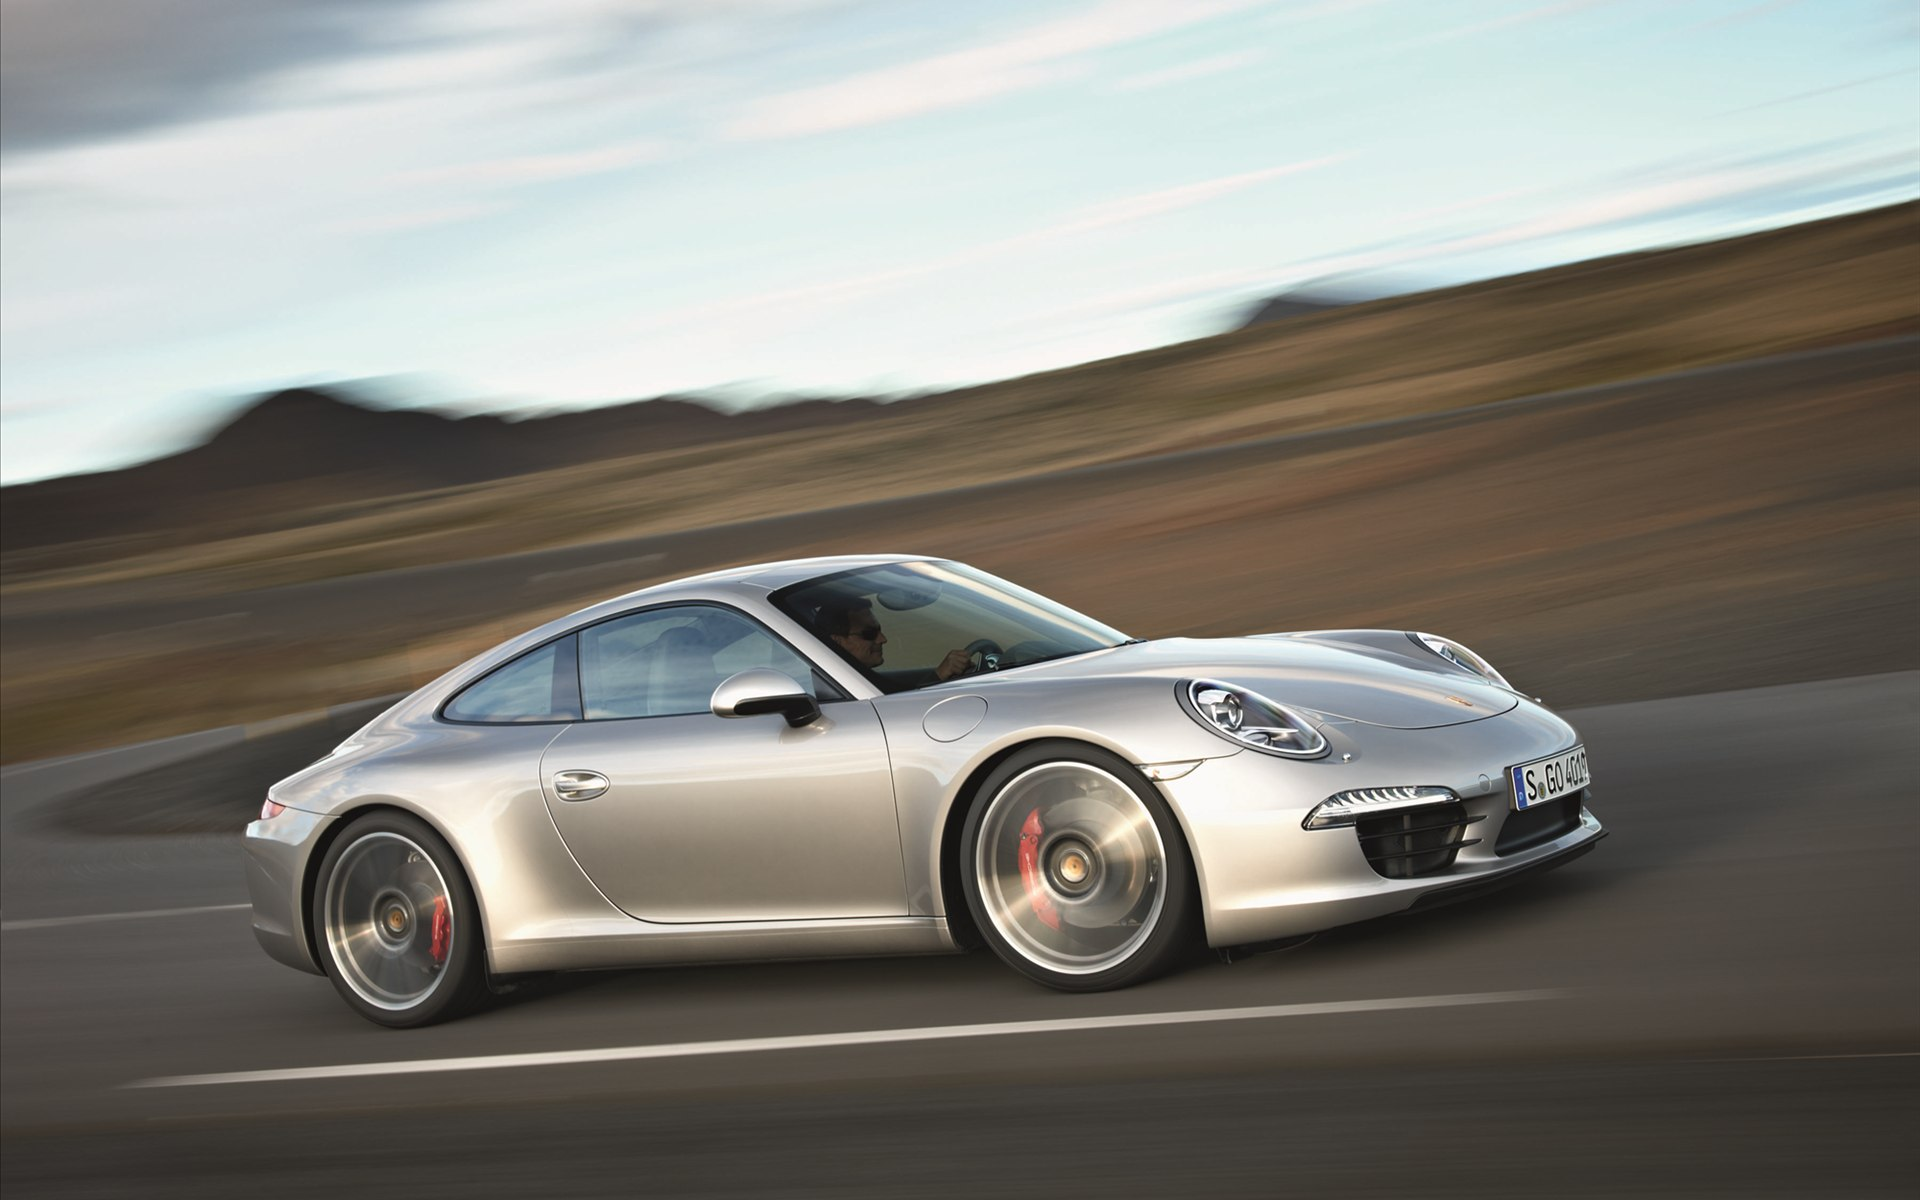 2012 Porsche 911 Carrera S Wallpaper 2 Sense The Car 1920x1200